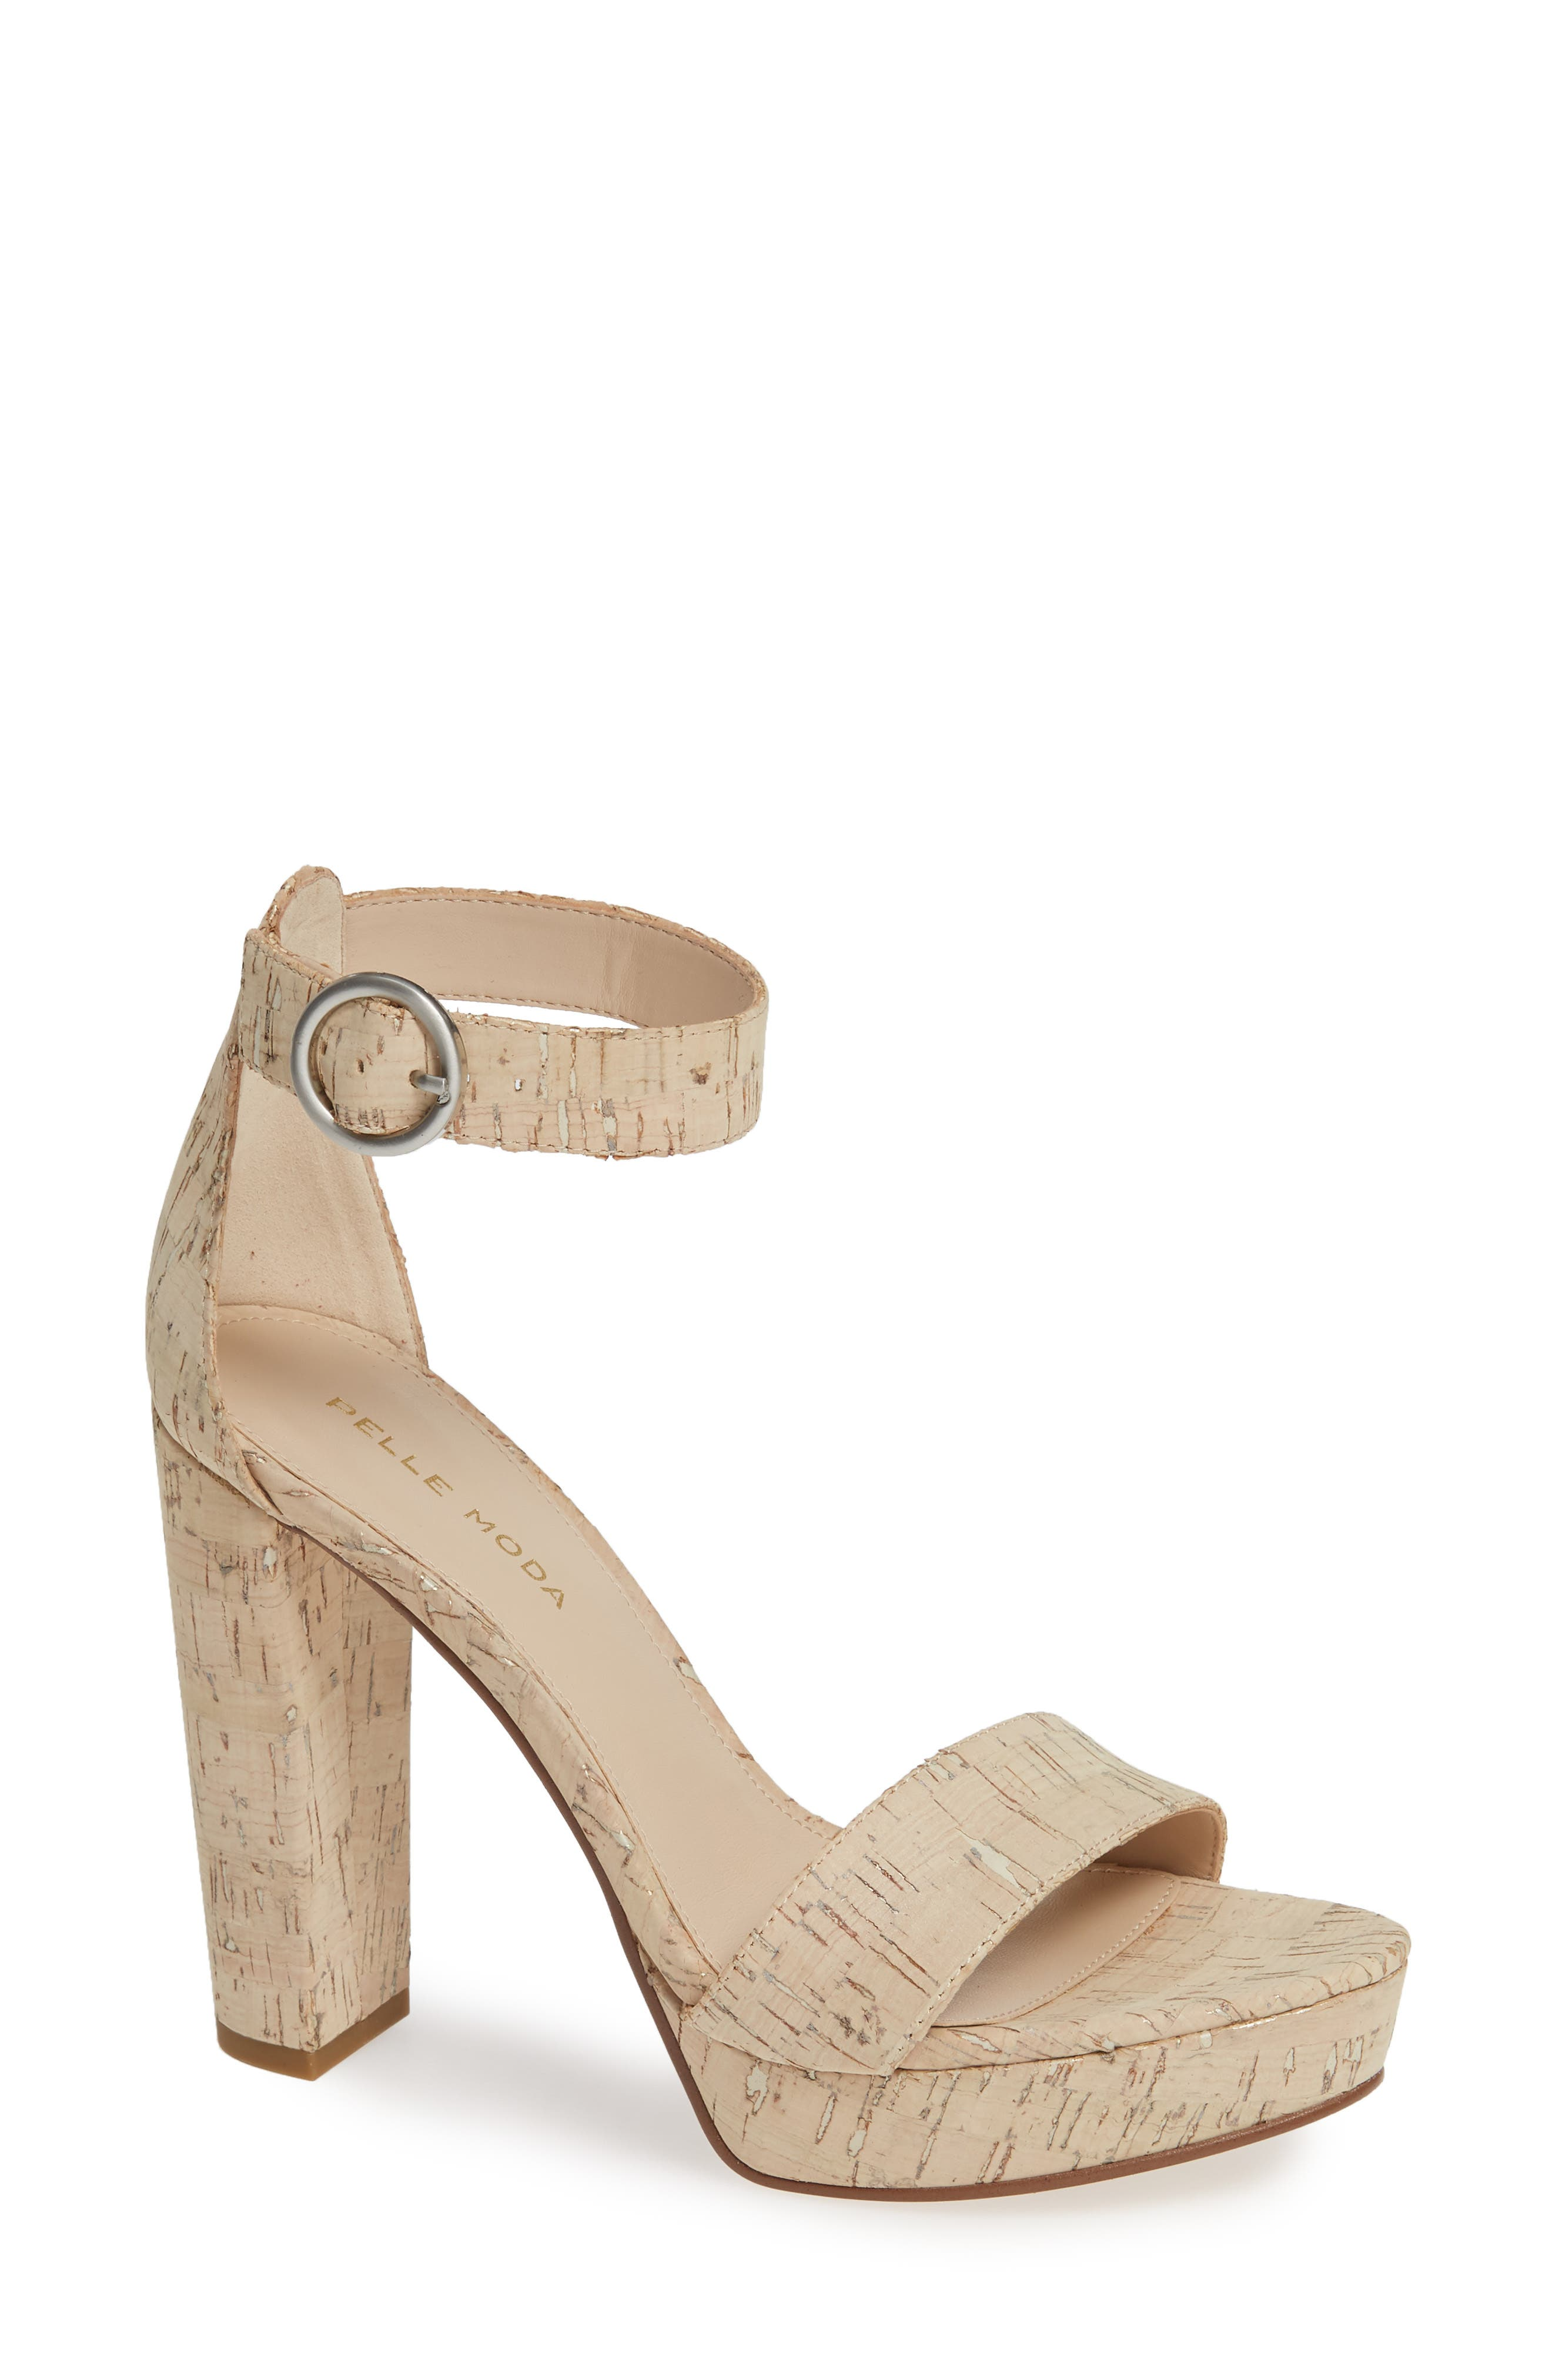 PELLE MODA,                             Palo 2 Platform Sandal,                             Main thumbnail 1, color,                             WHITE WASHED CORK